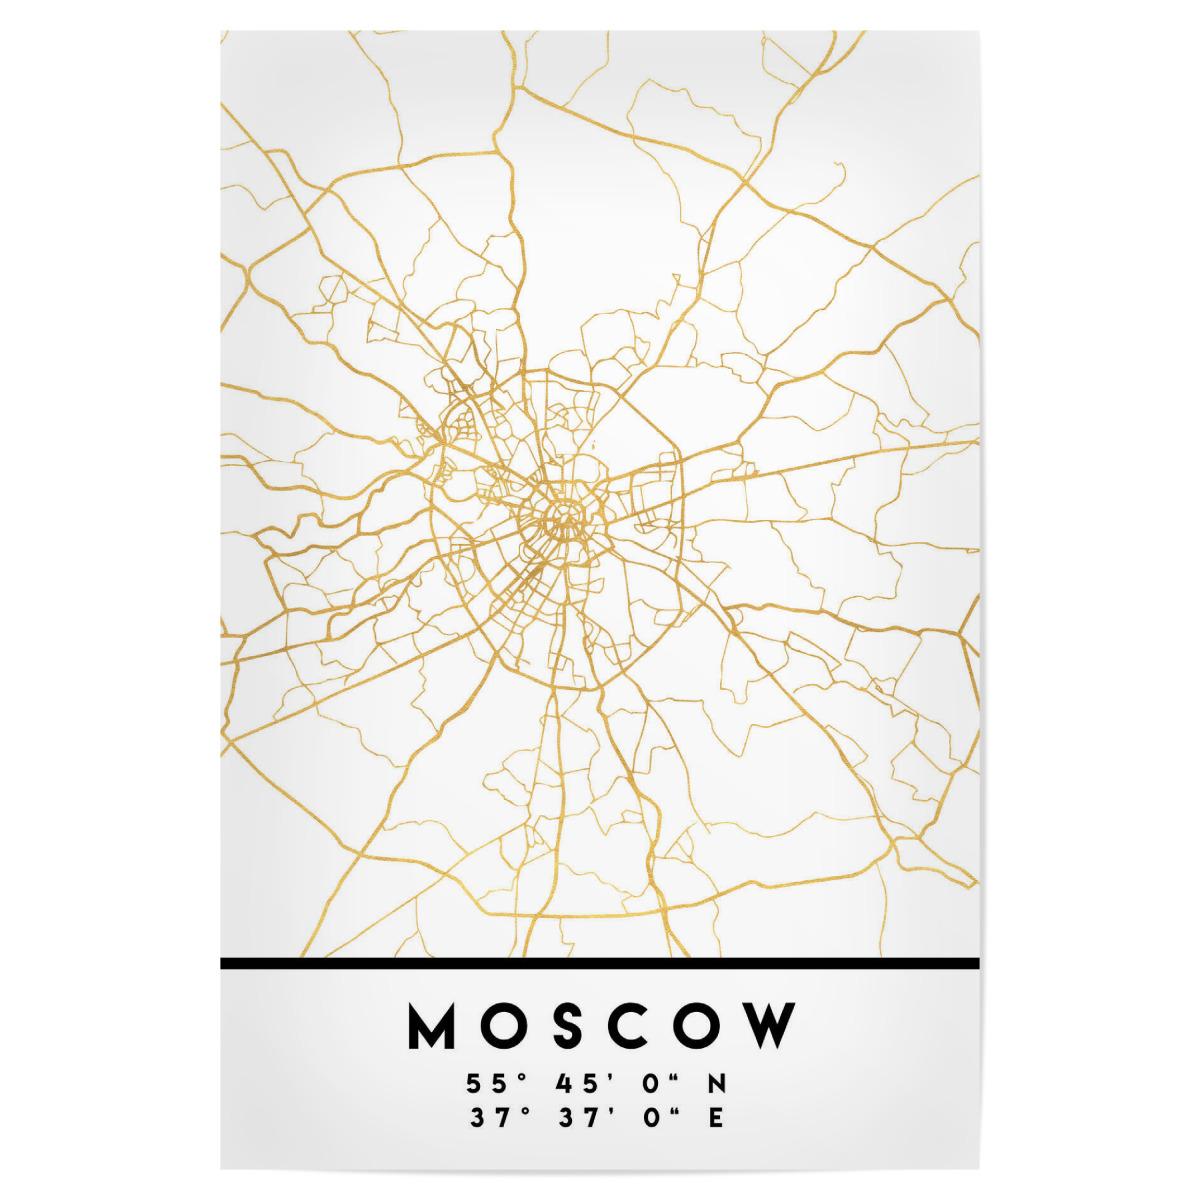 MOSCOW RUSSIA STREET MAP ART als Poster bei artboxONE kaufen